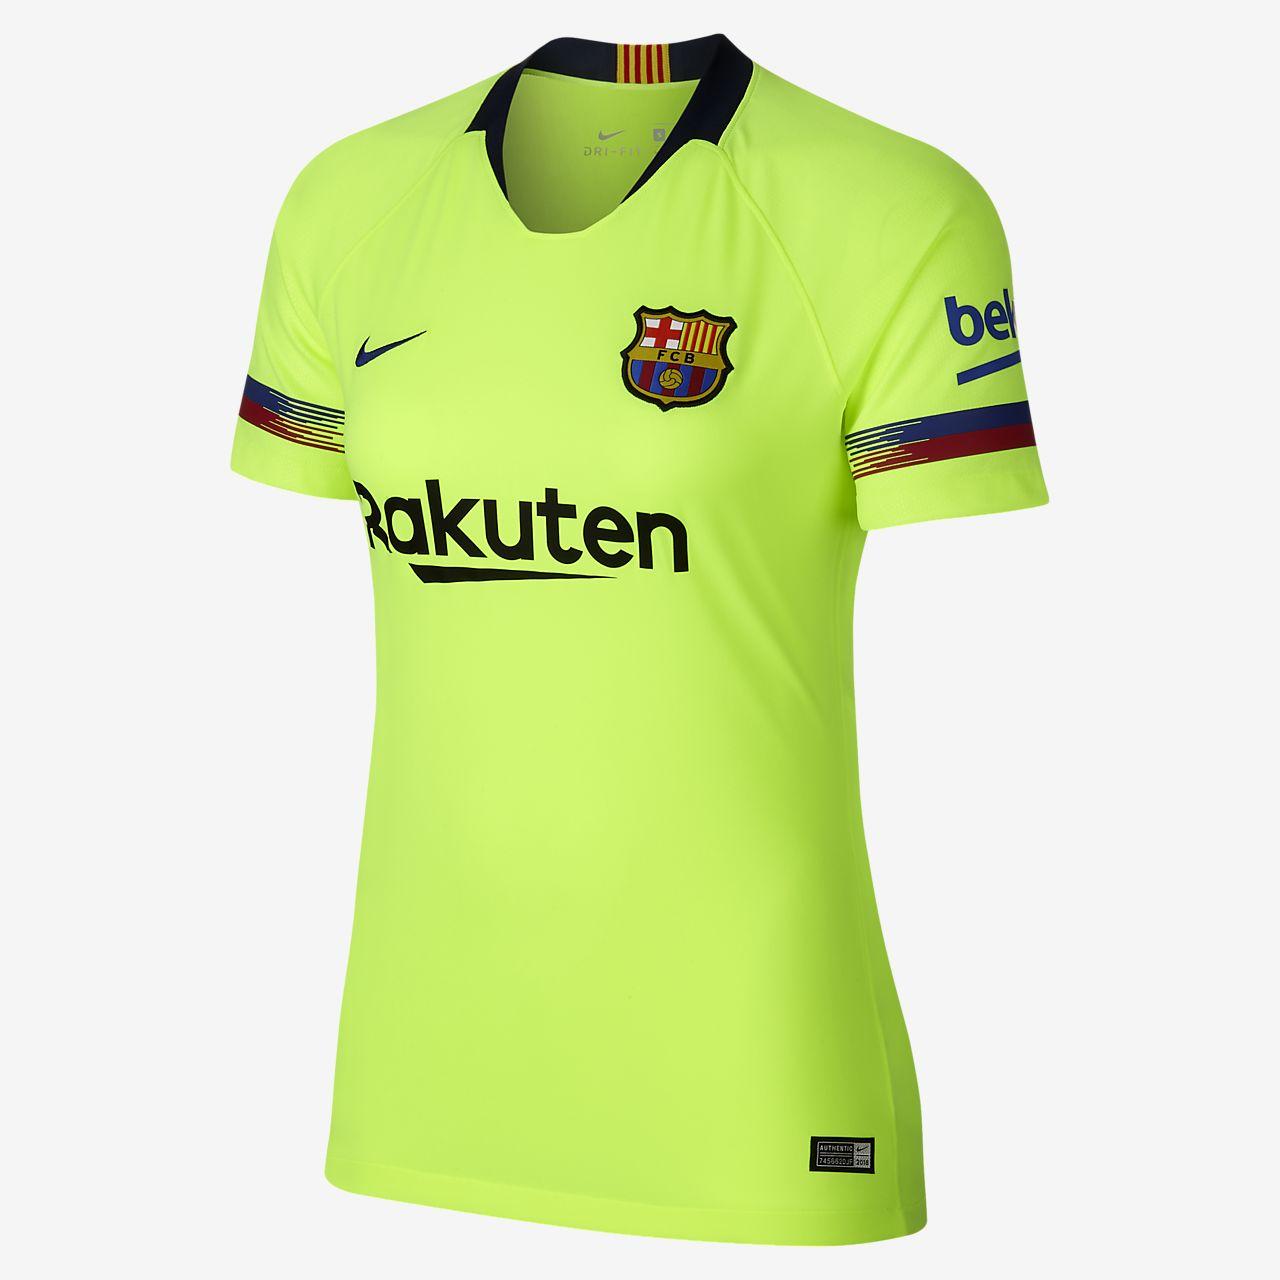 Damska wyjazdowa koszulka piłkarska 201819 FC Barcelona Stadium